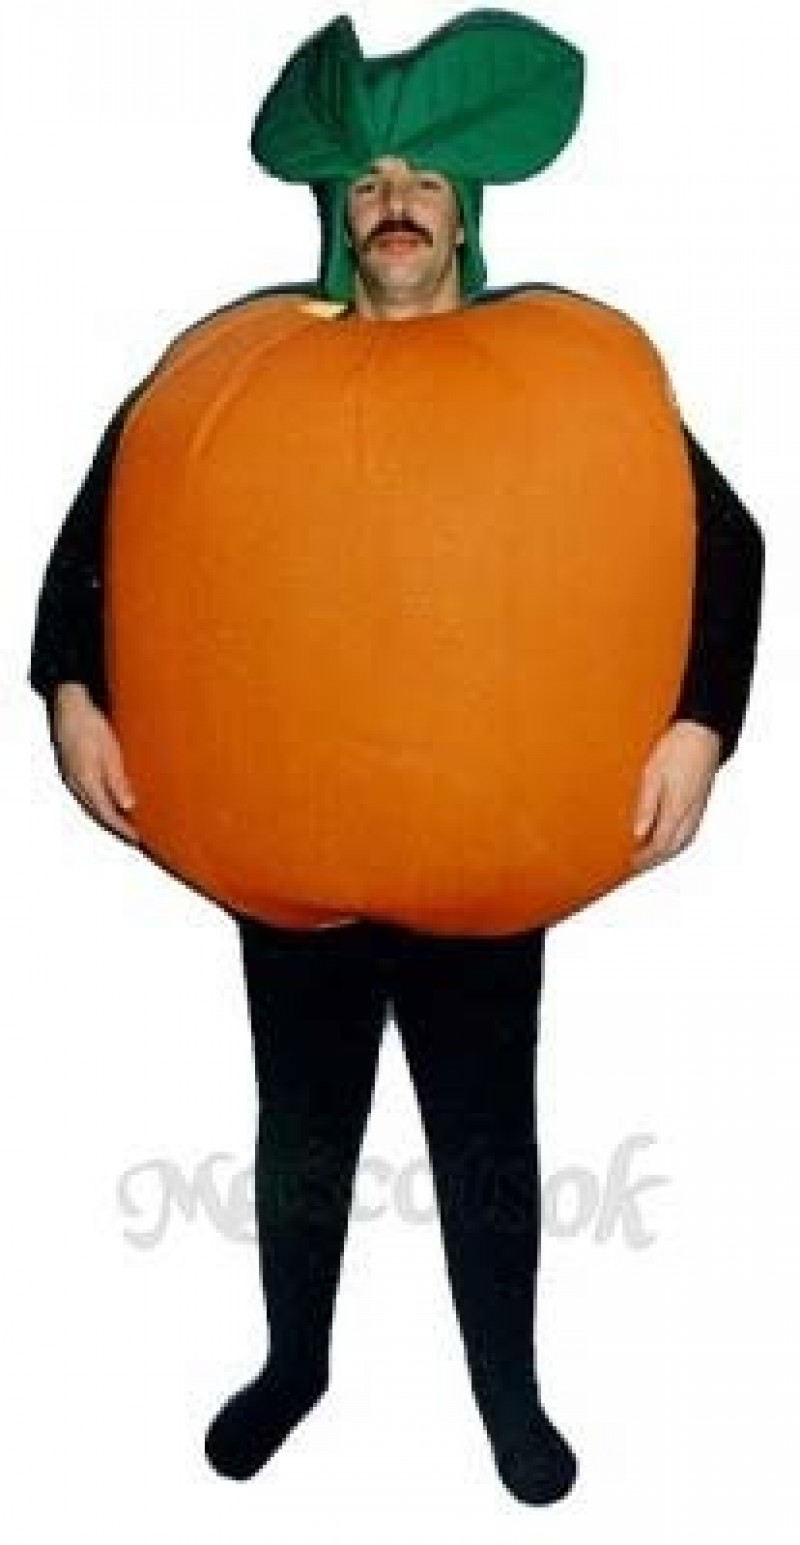 Orange Mascot Costume